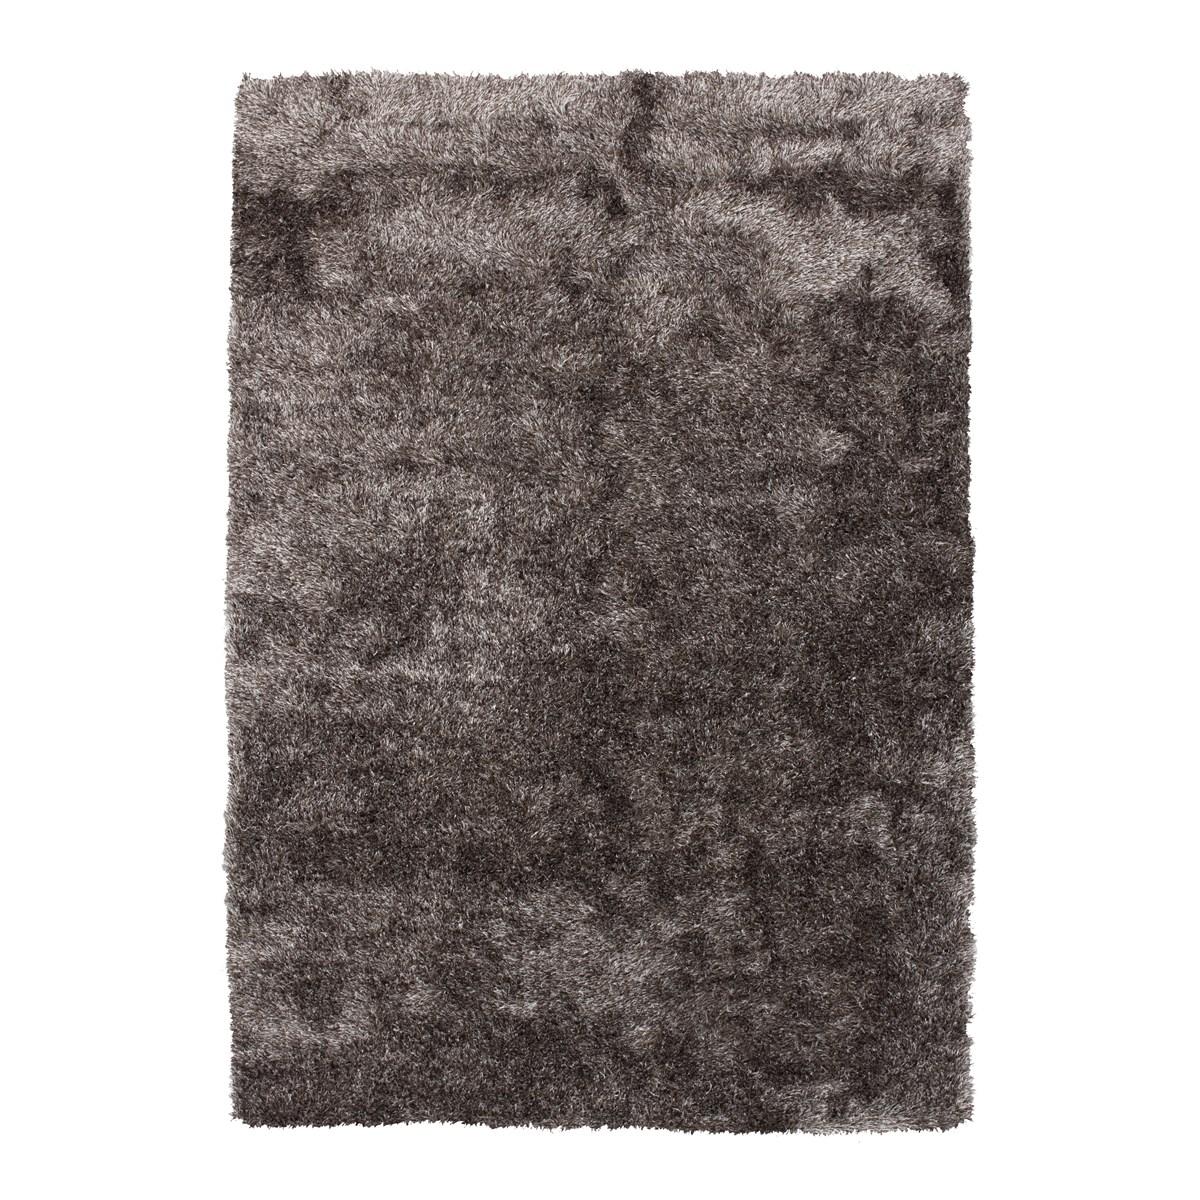 Tapis shaggy en Polyester Gris anthracite 200x290 cm